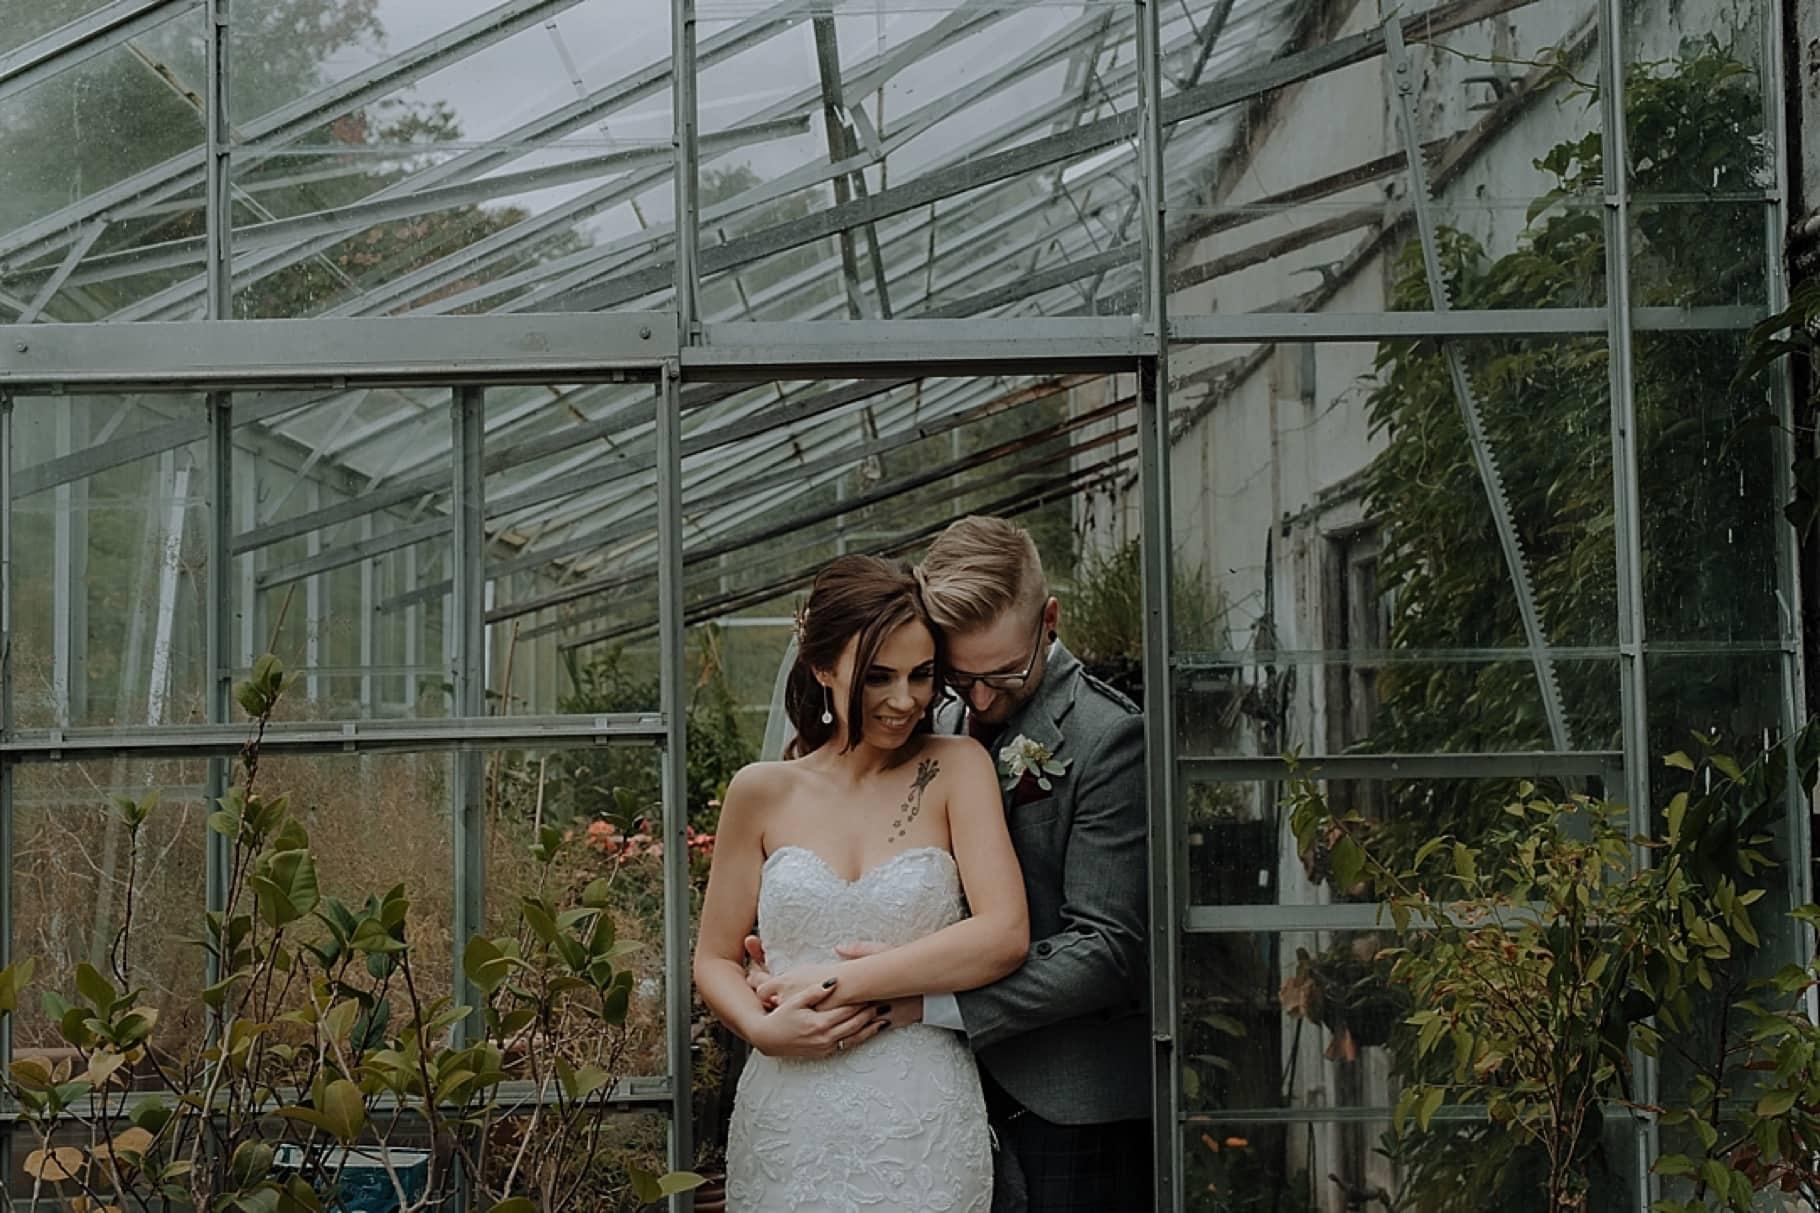 Greenhouse wedding photo at Colstoun